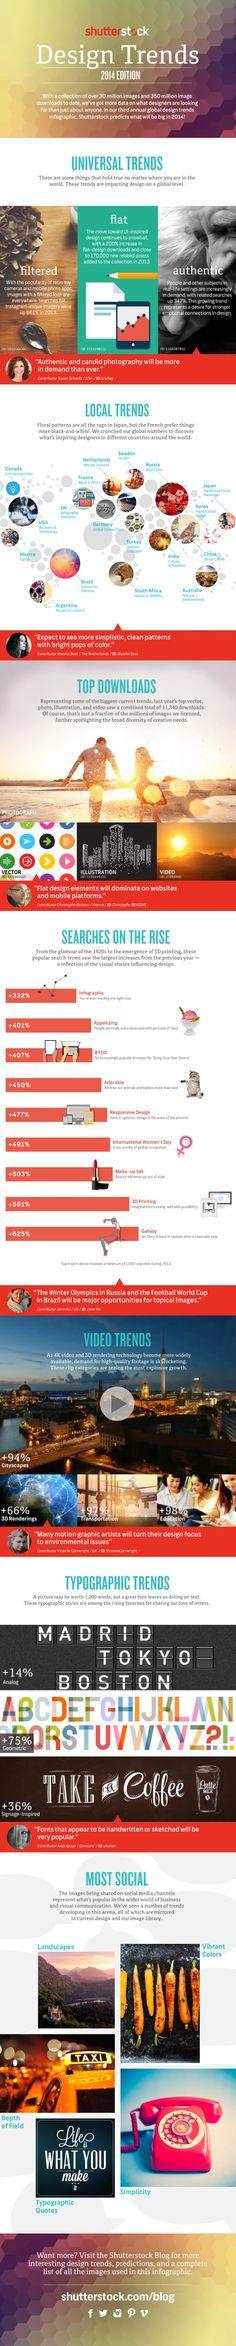 Shutterstock-infographic-3.jpg 625×6213 px